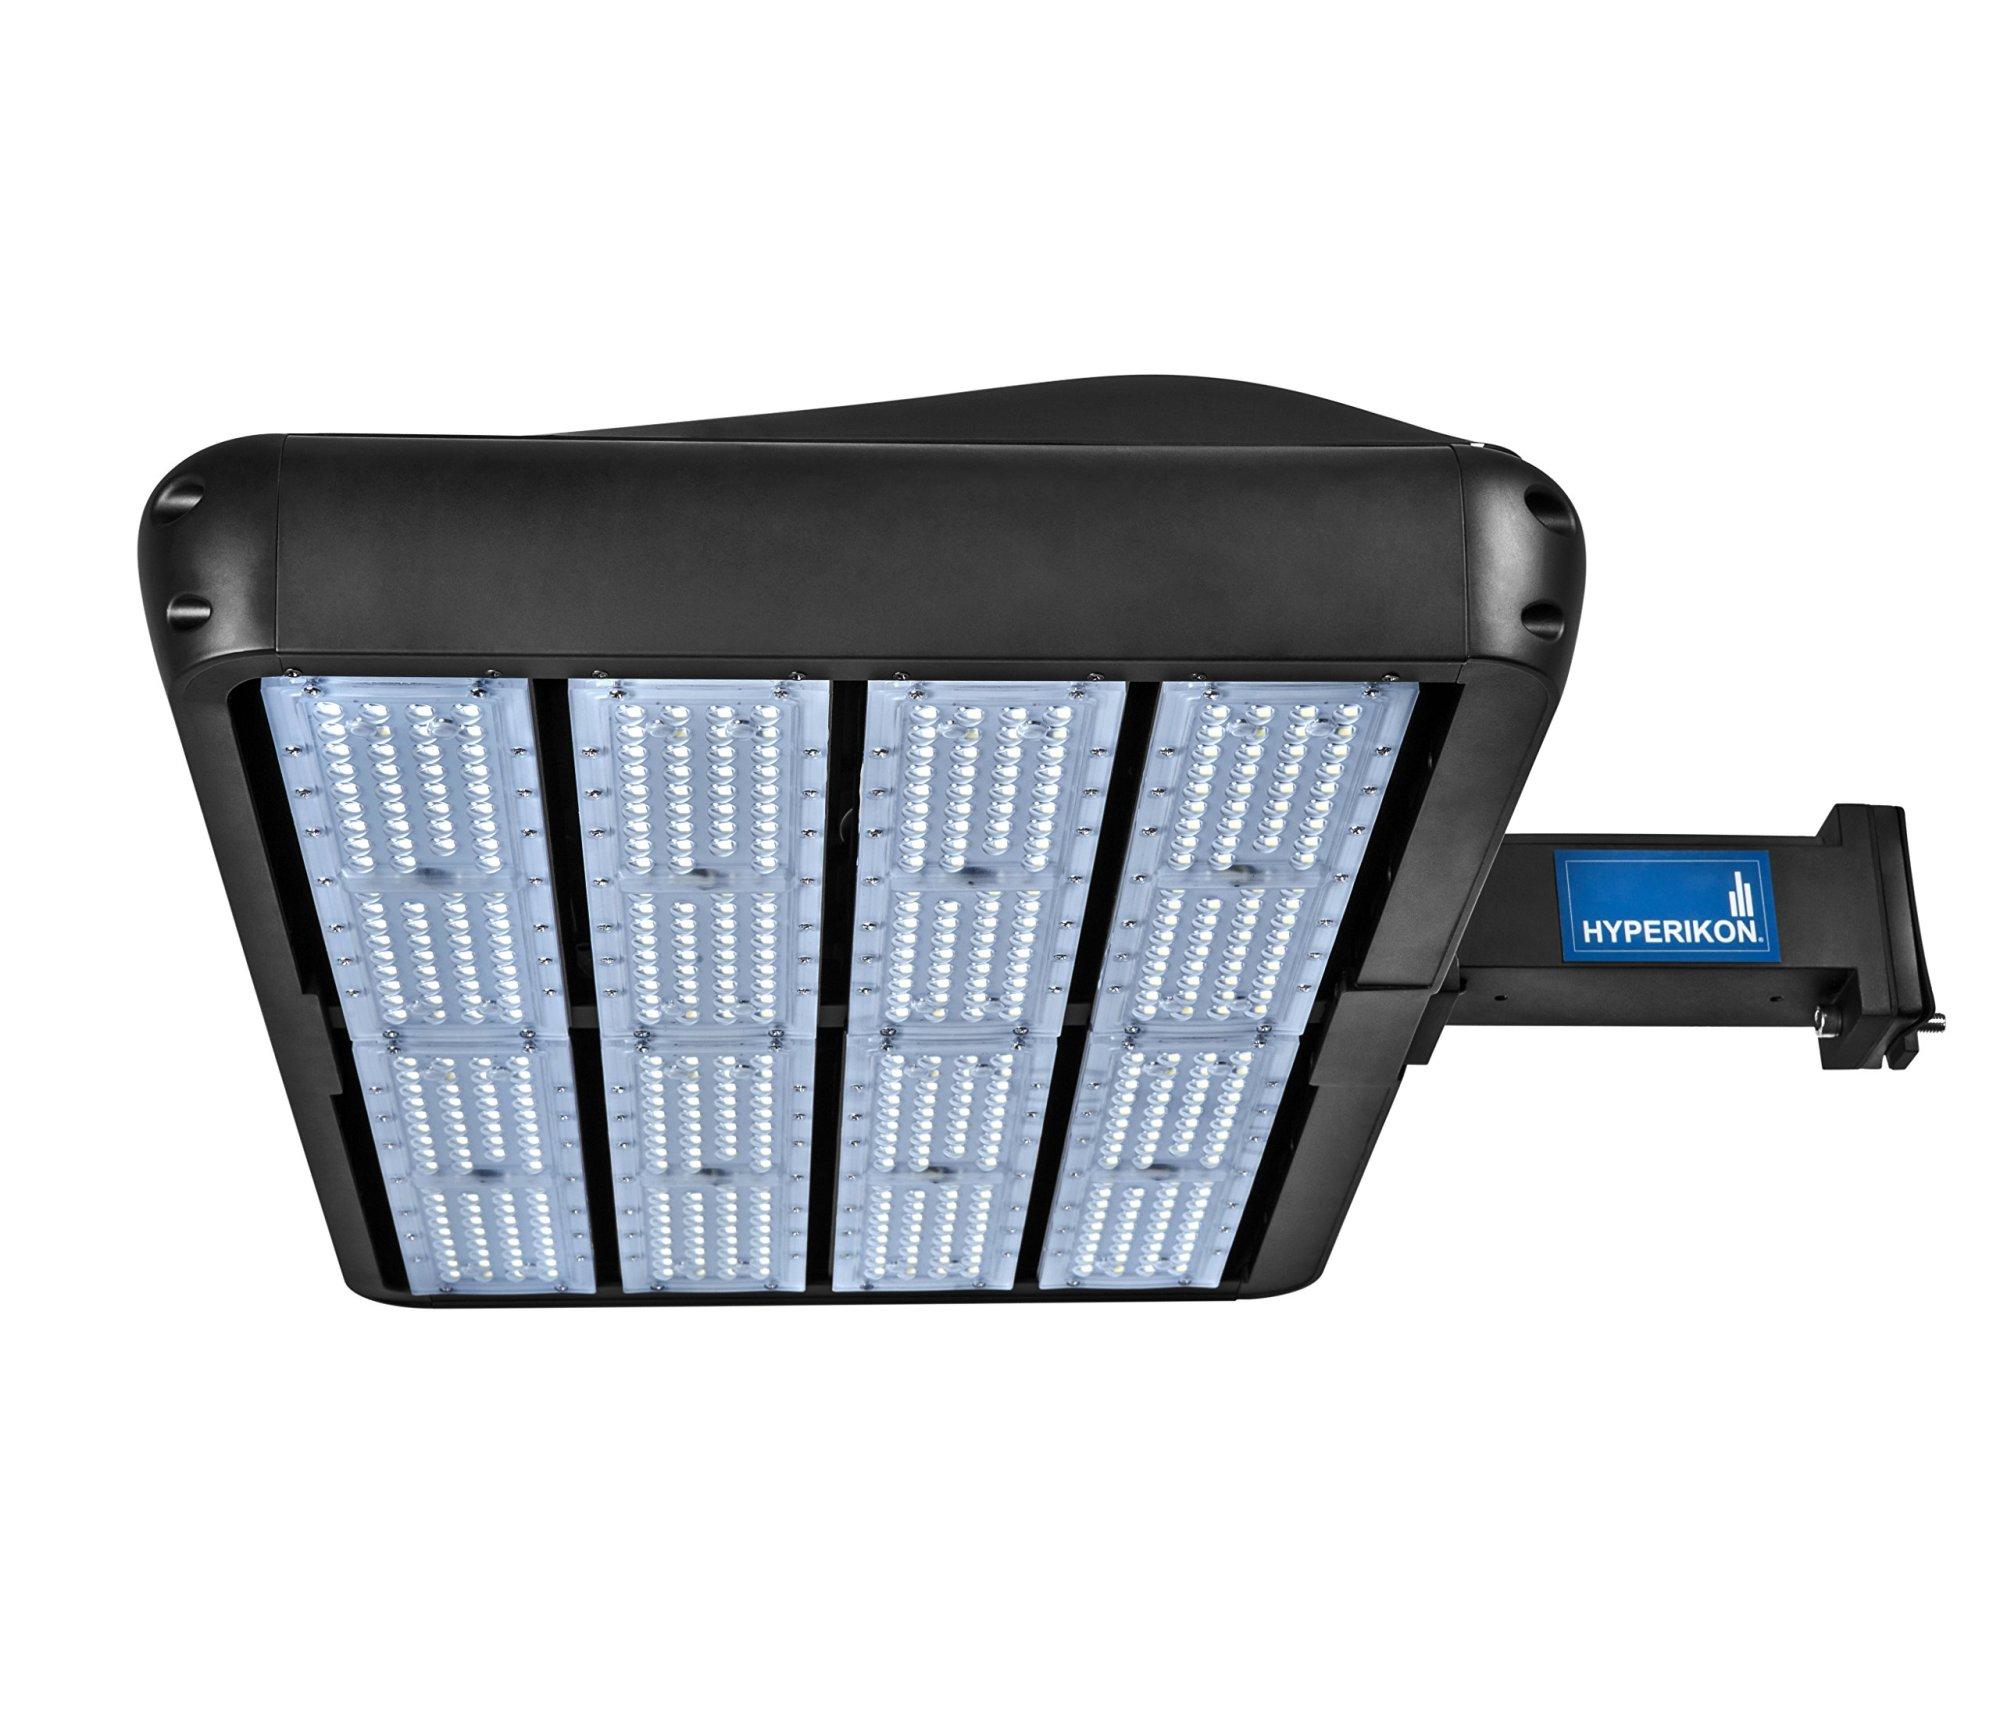 hight resolution of hyperikon parking lot lights led shoebox pole light 400w hid hps replacement